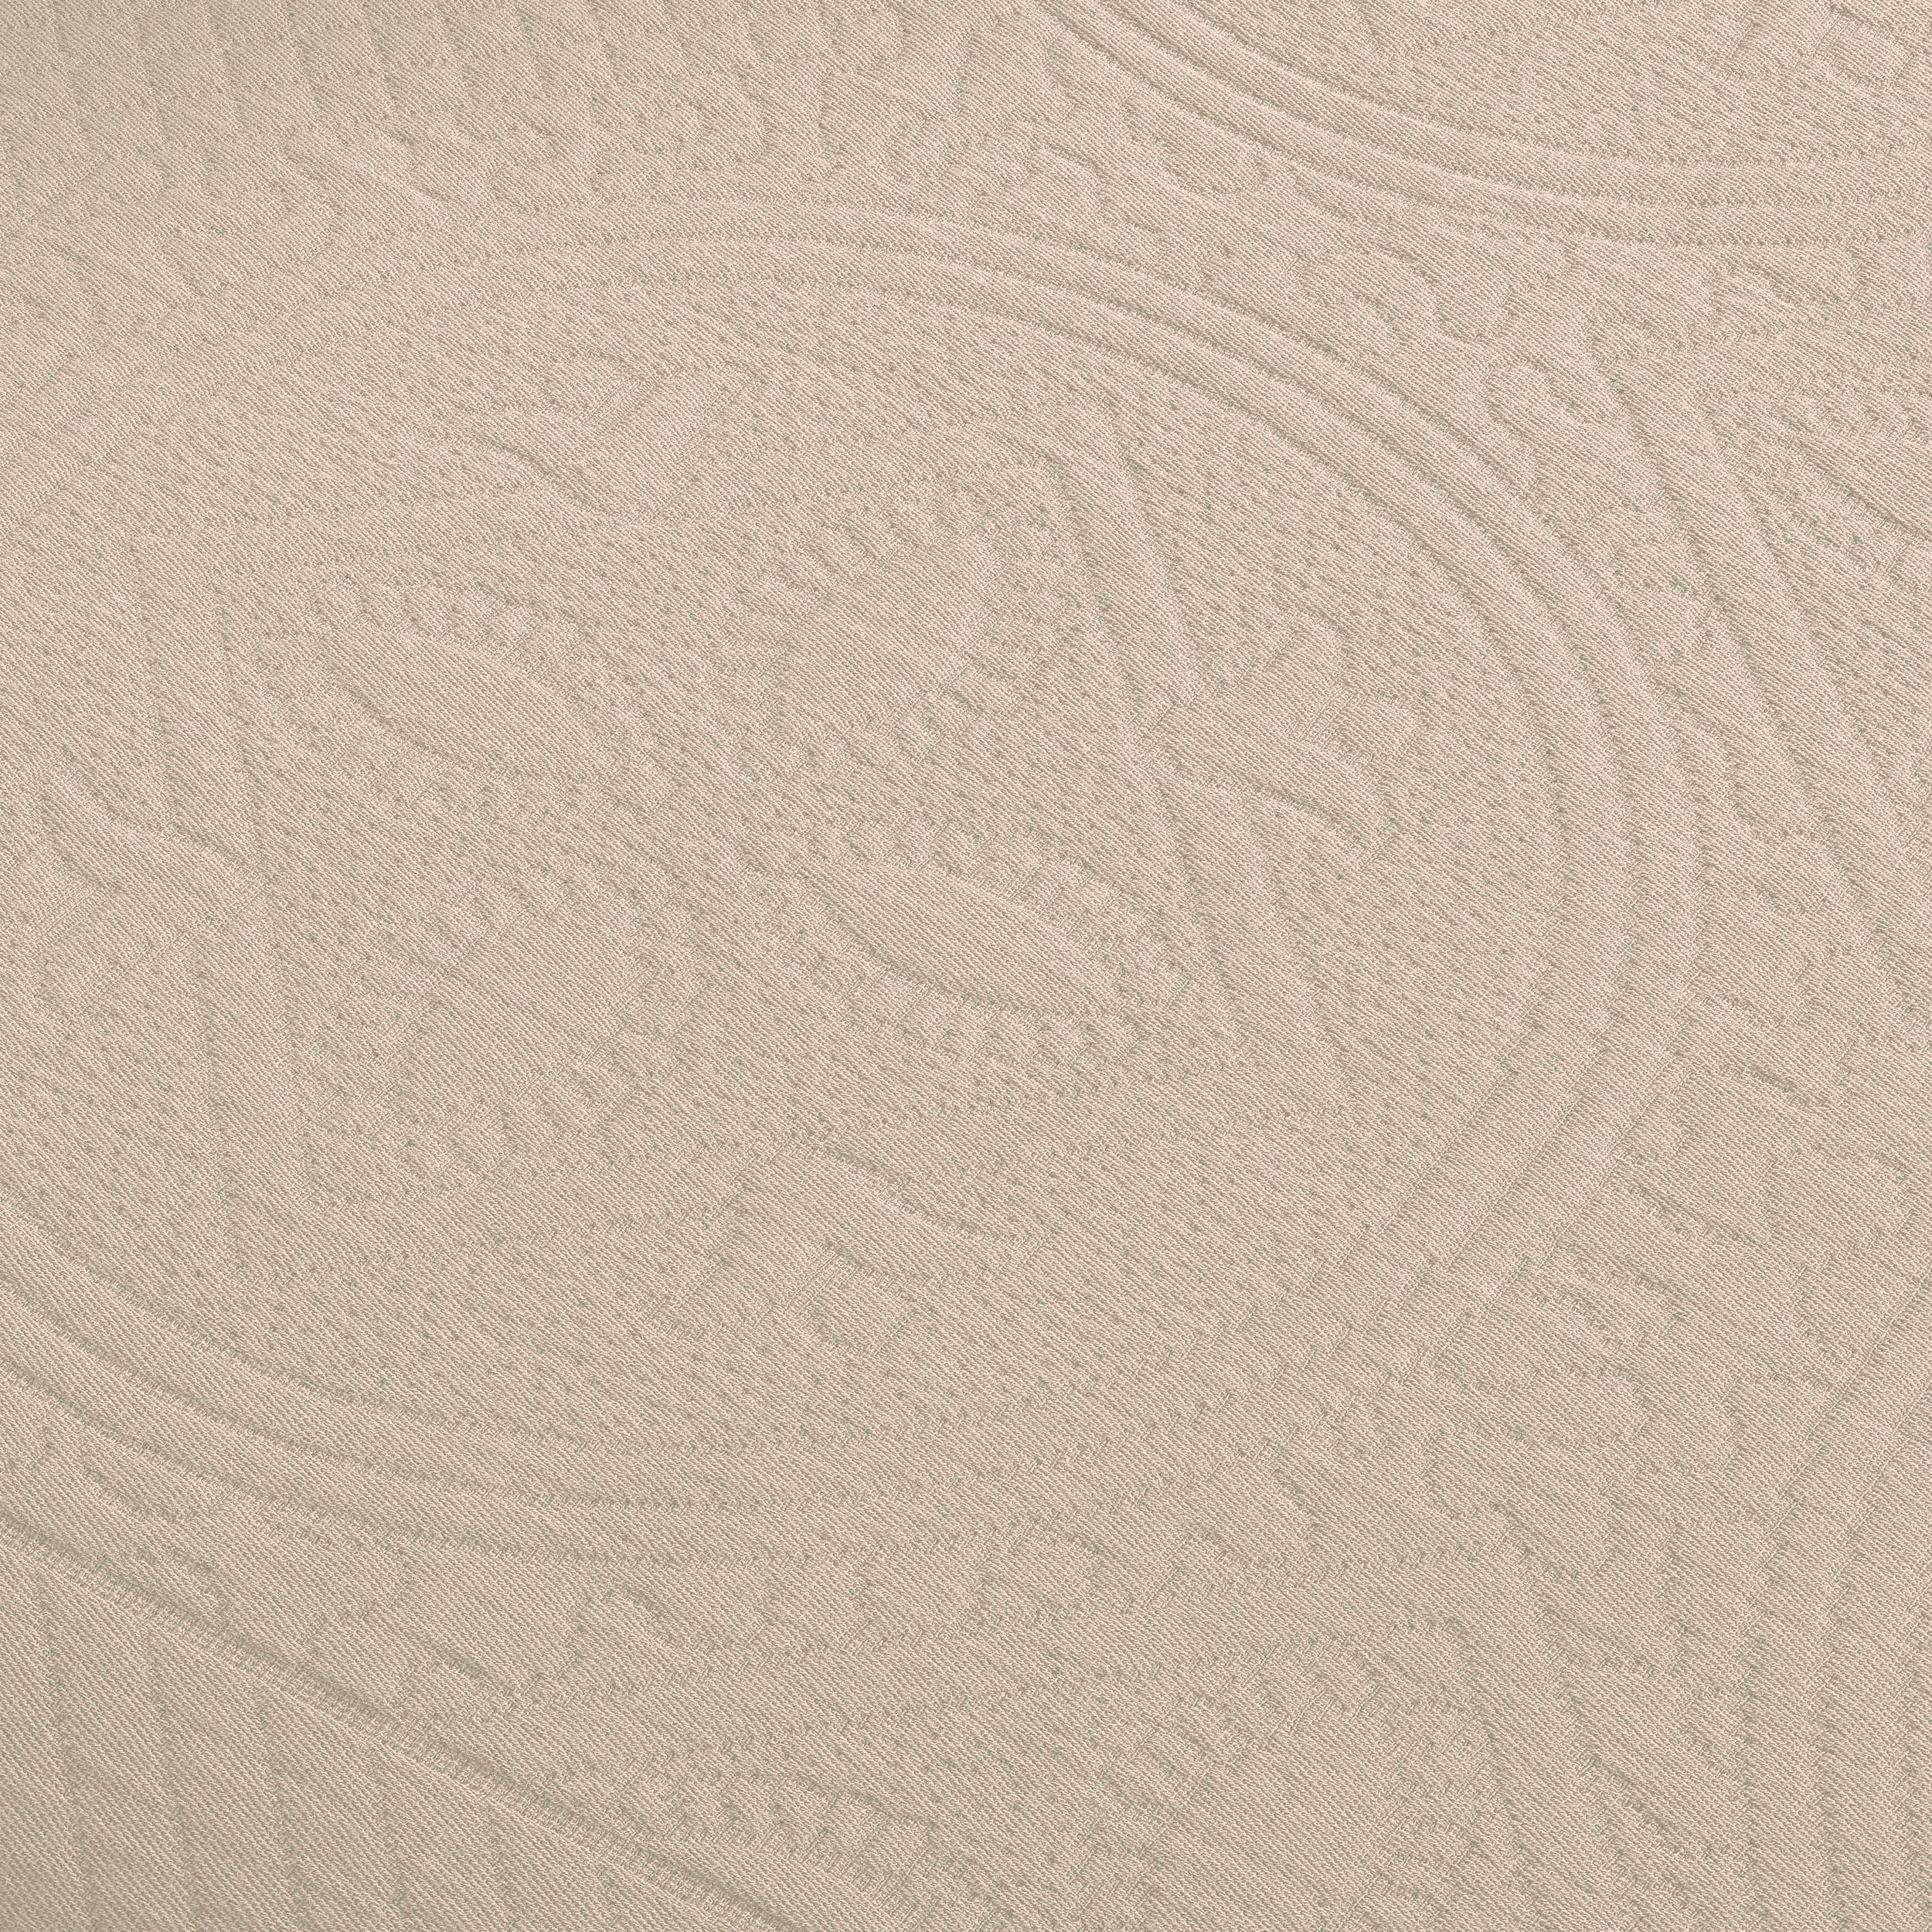 Celtic-Circle-Cotton-Jacquard-Matelasse-Scalloped-Bedspread-Set thumbnail 5